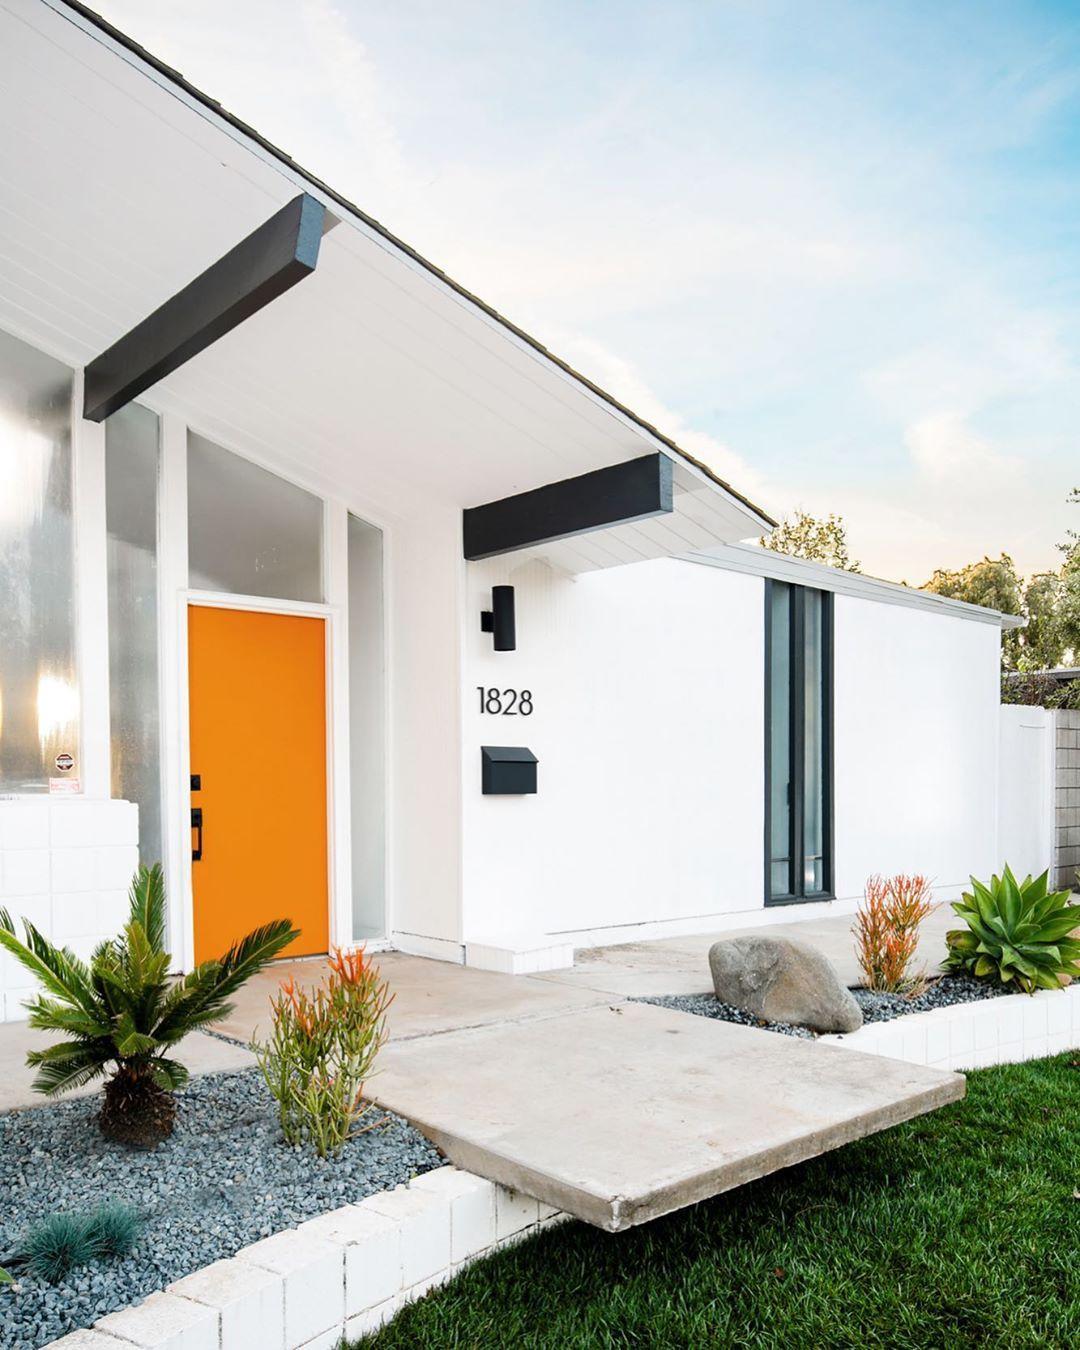 Maverick Design On Instagram Coming Soon This Gorgeous Mid Century Ho Mid Century Modern House Exterior Mid Century Modern Exterior Mid Century Modern House